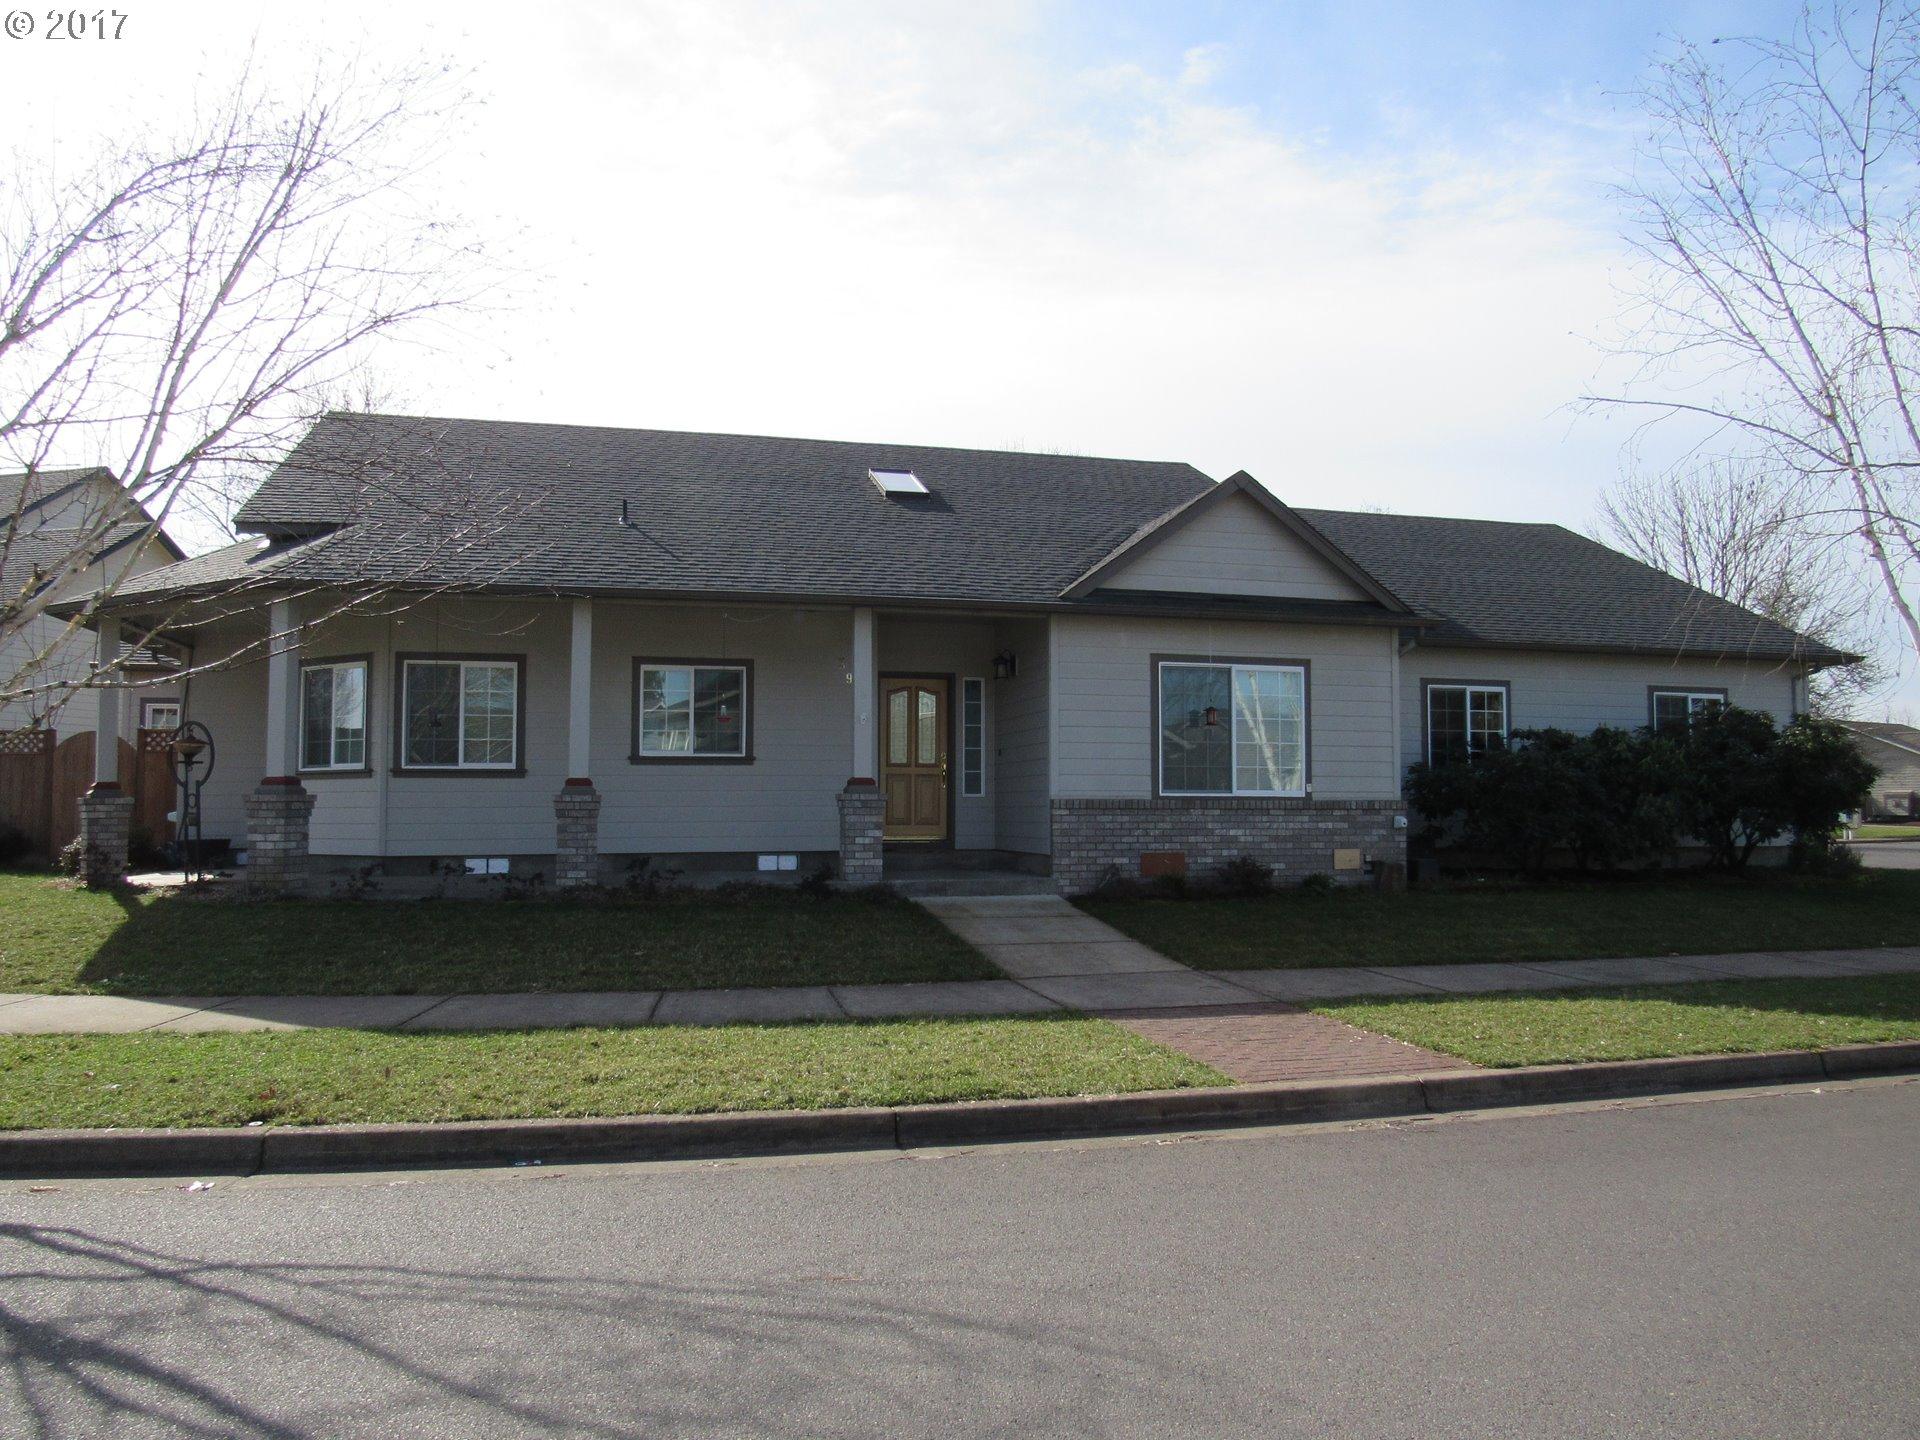 398 MACKIN AVE, Eugene OR 97404